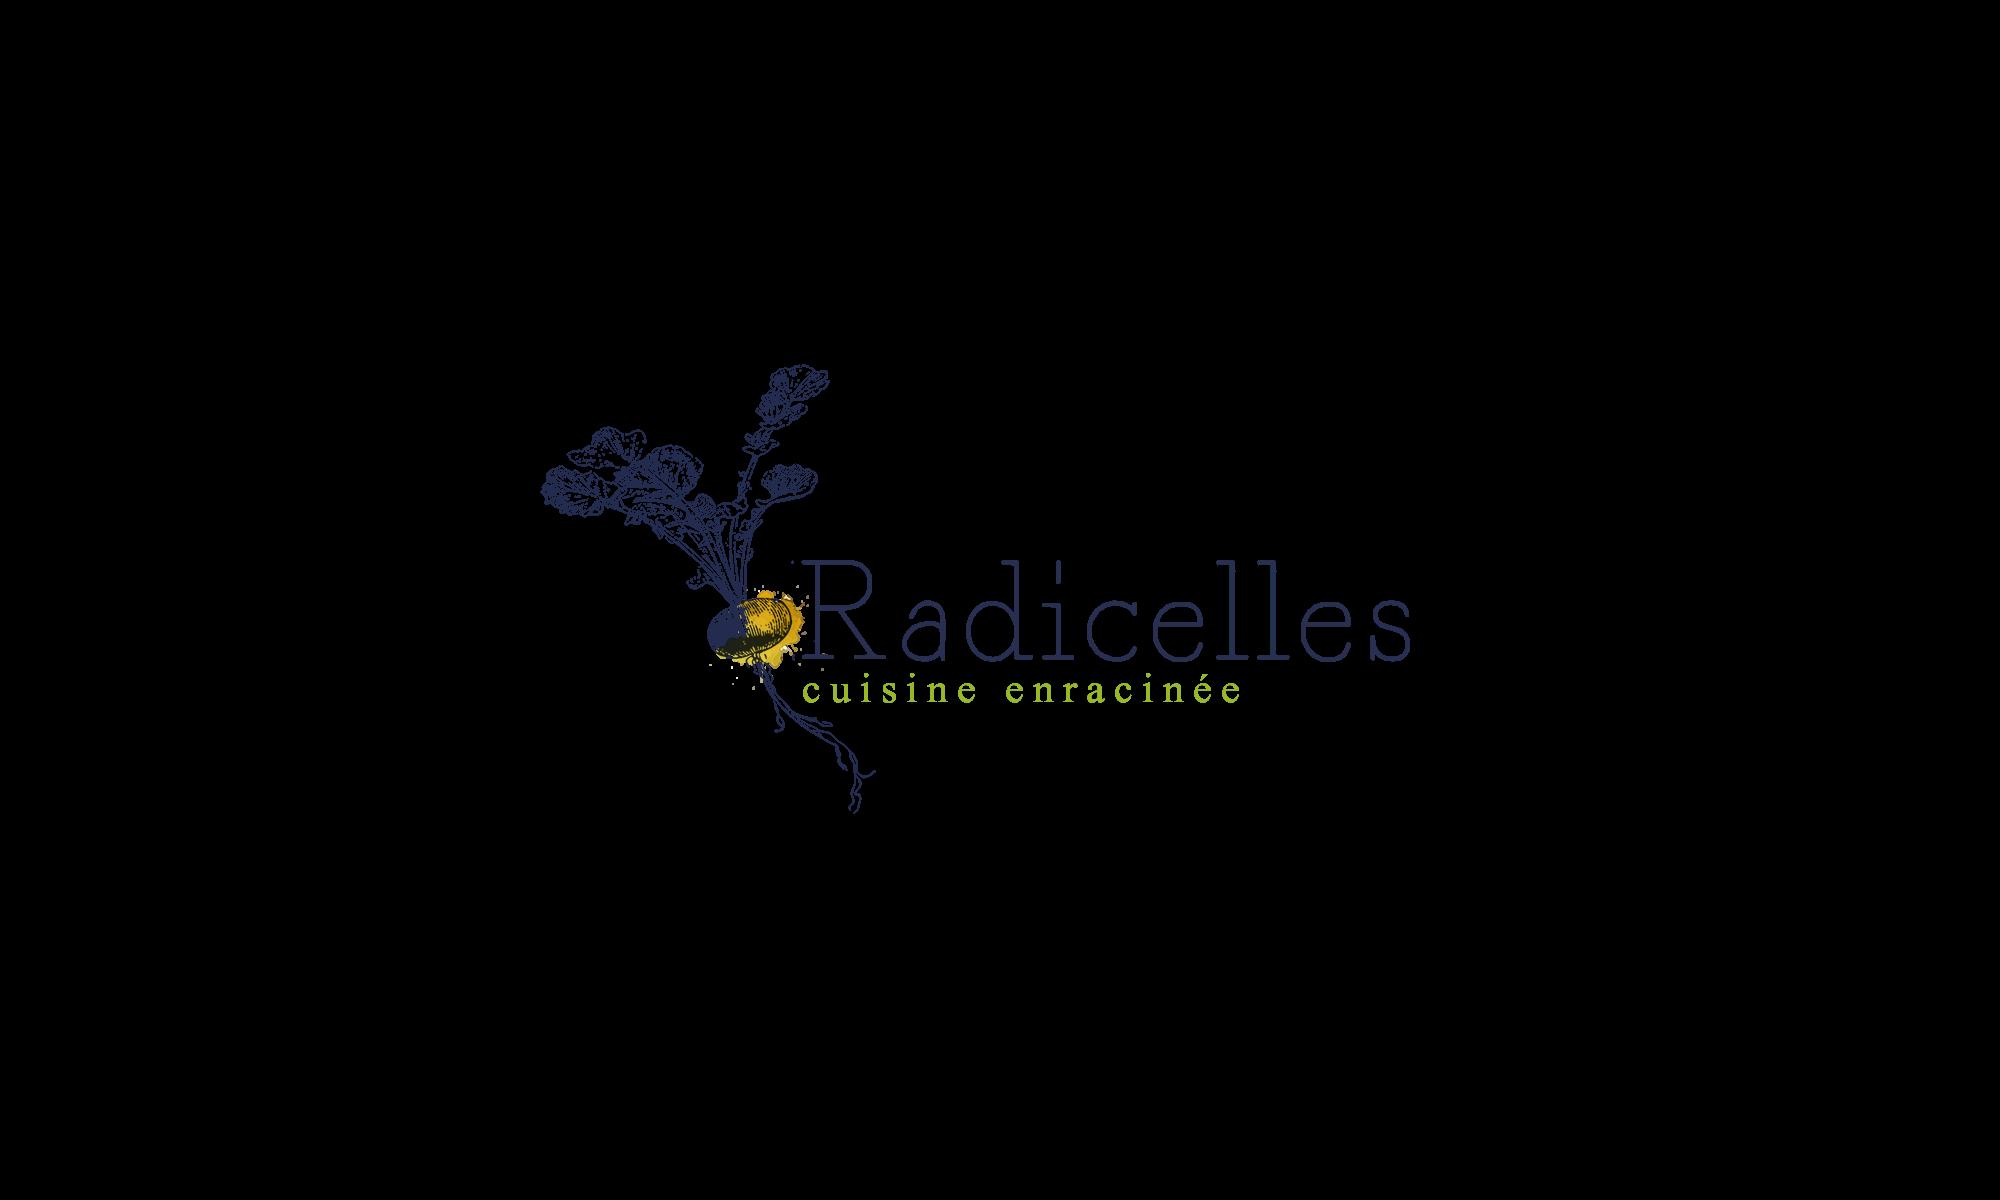 Radicelles